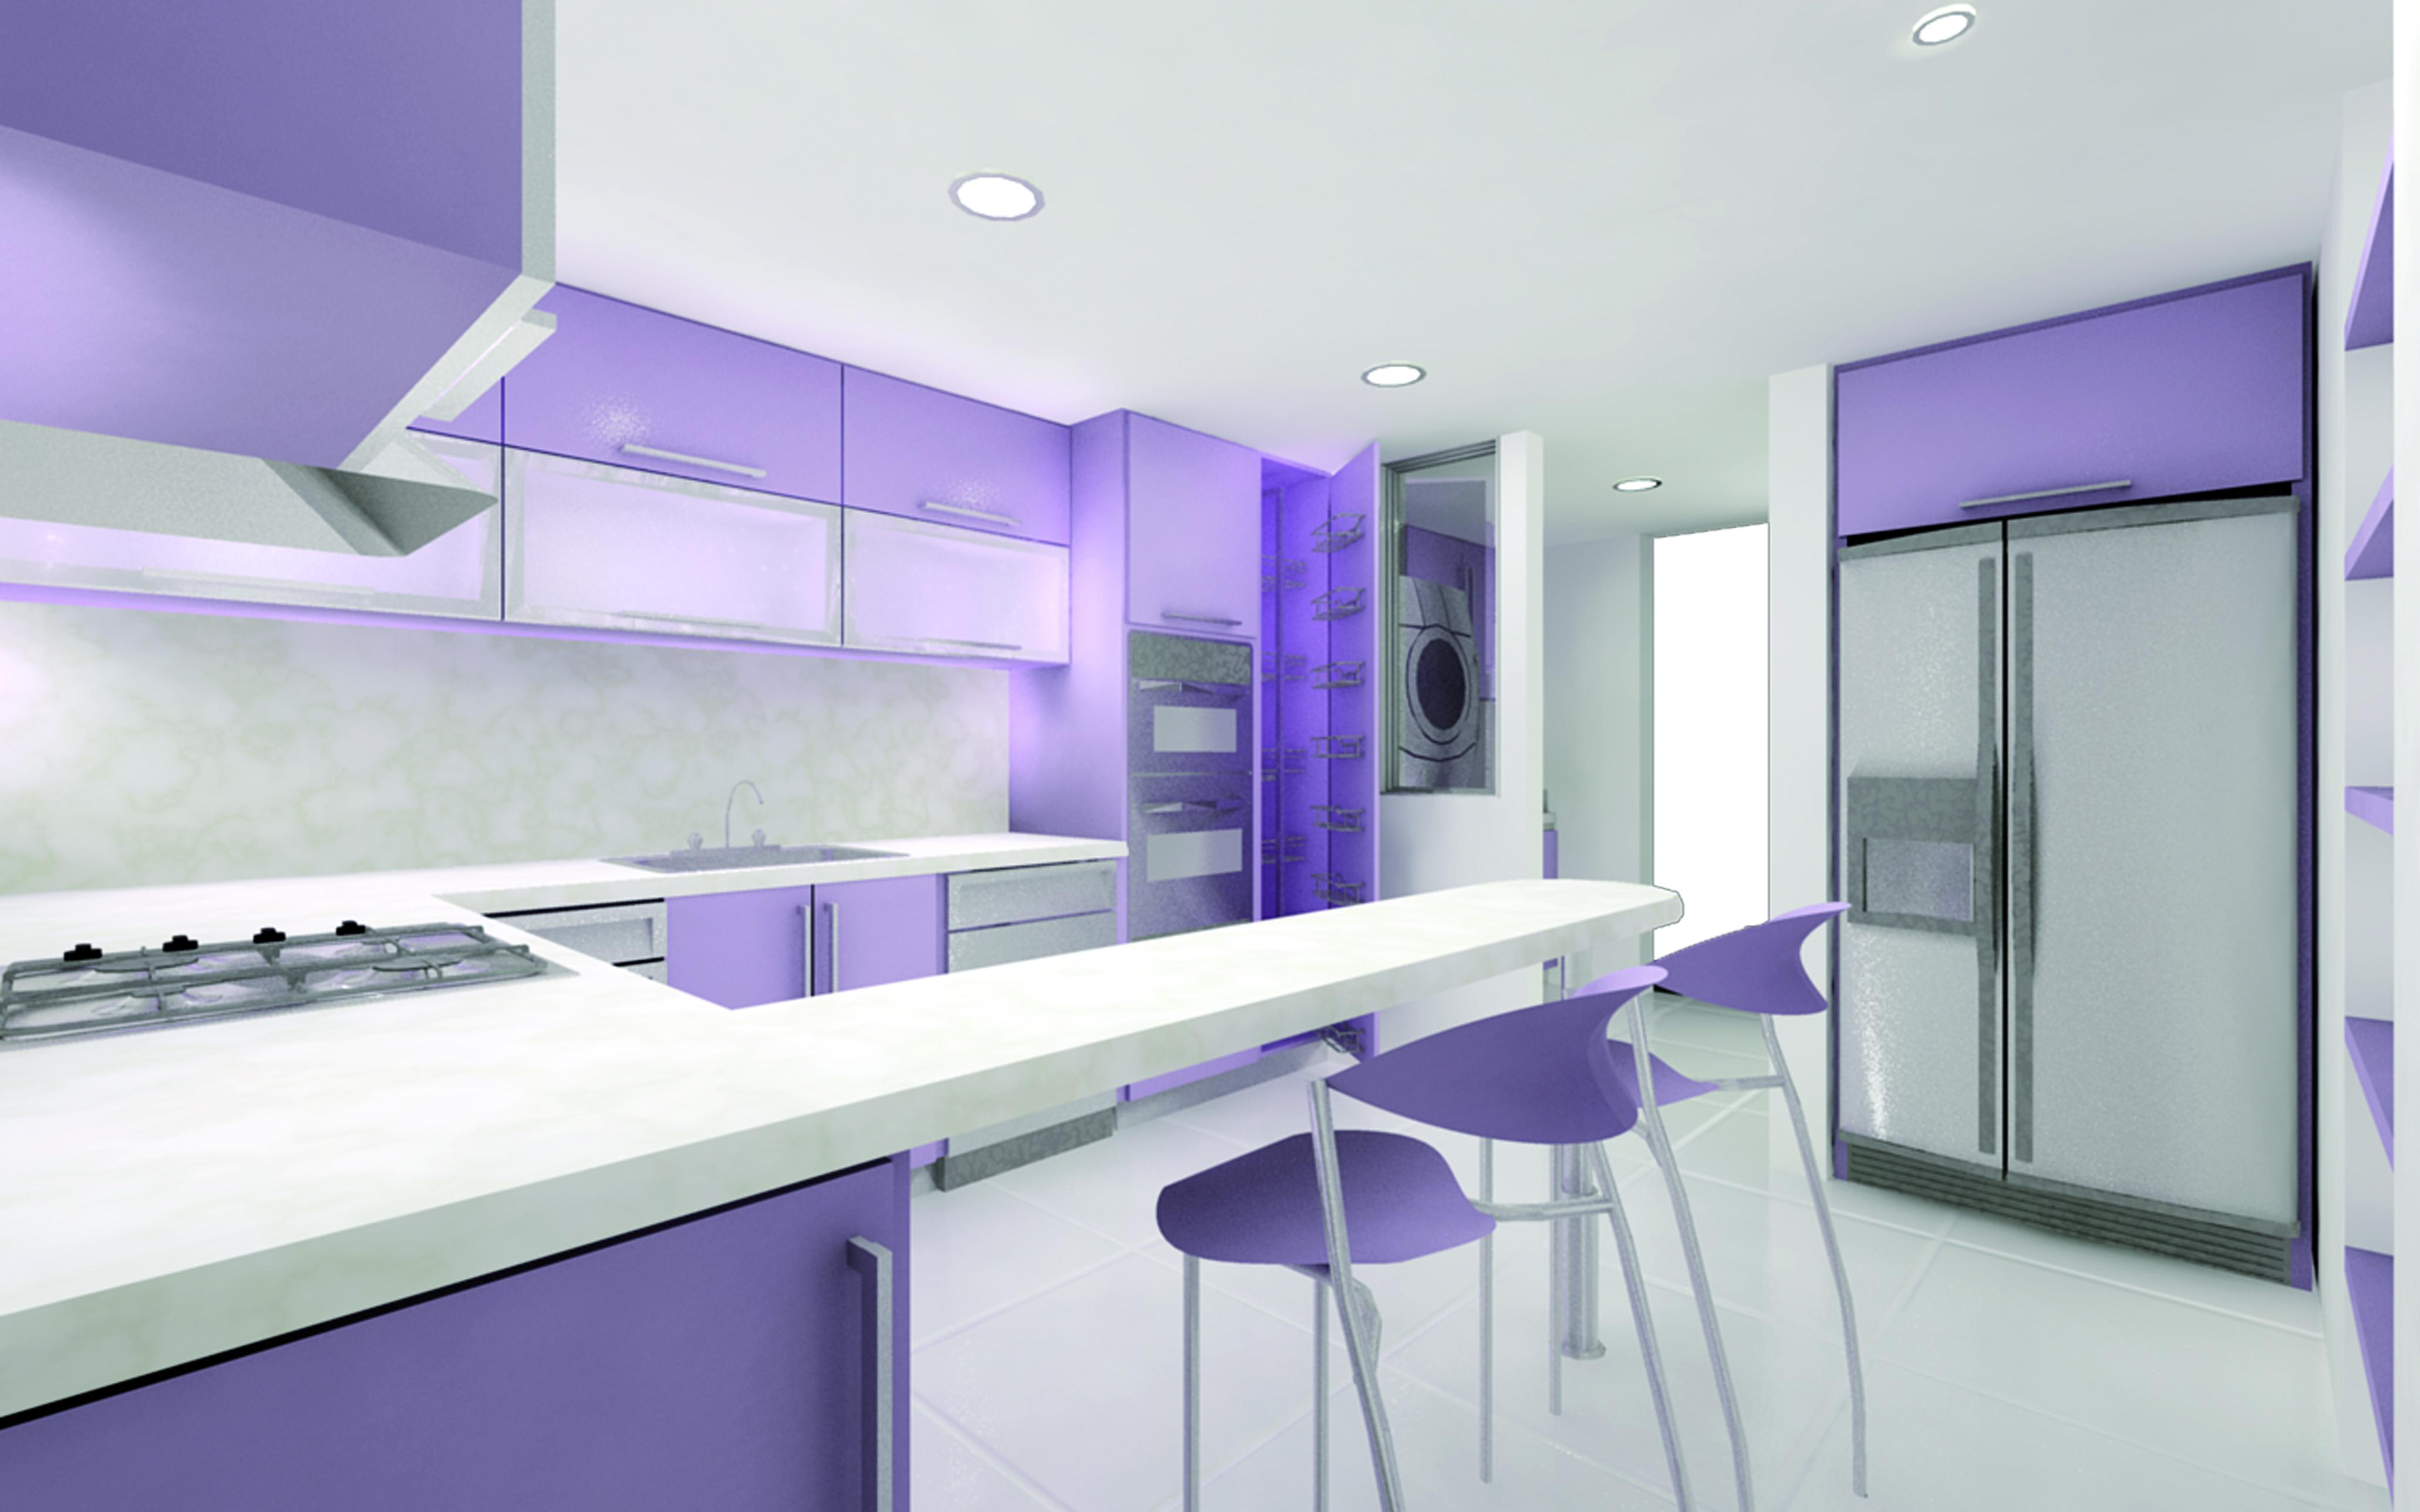 Картинка кухня в стиле лофт также признался